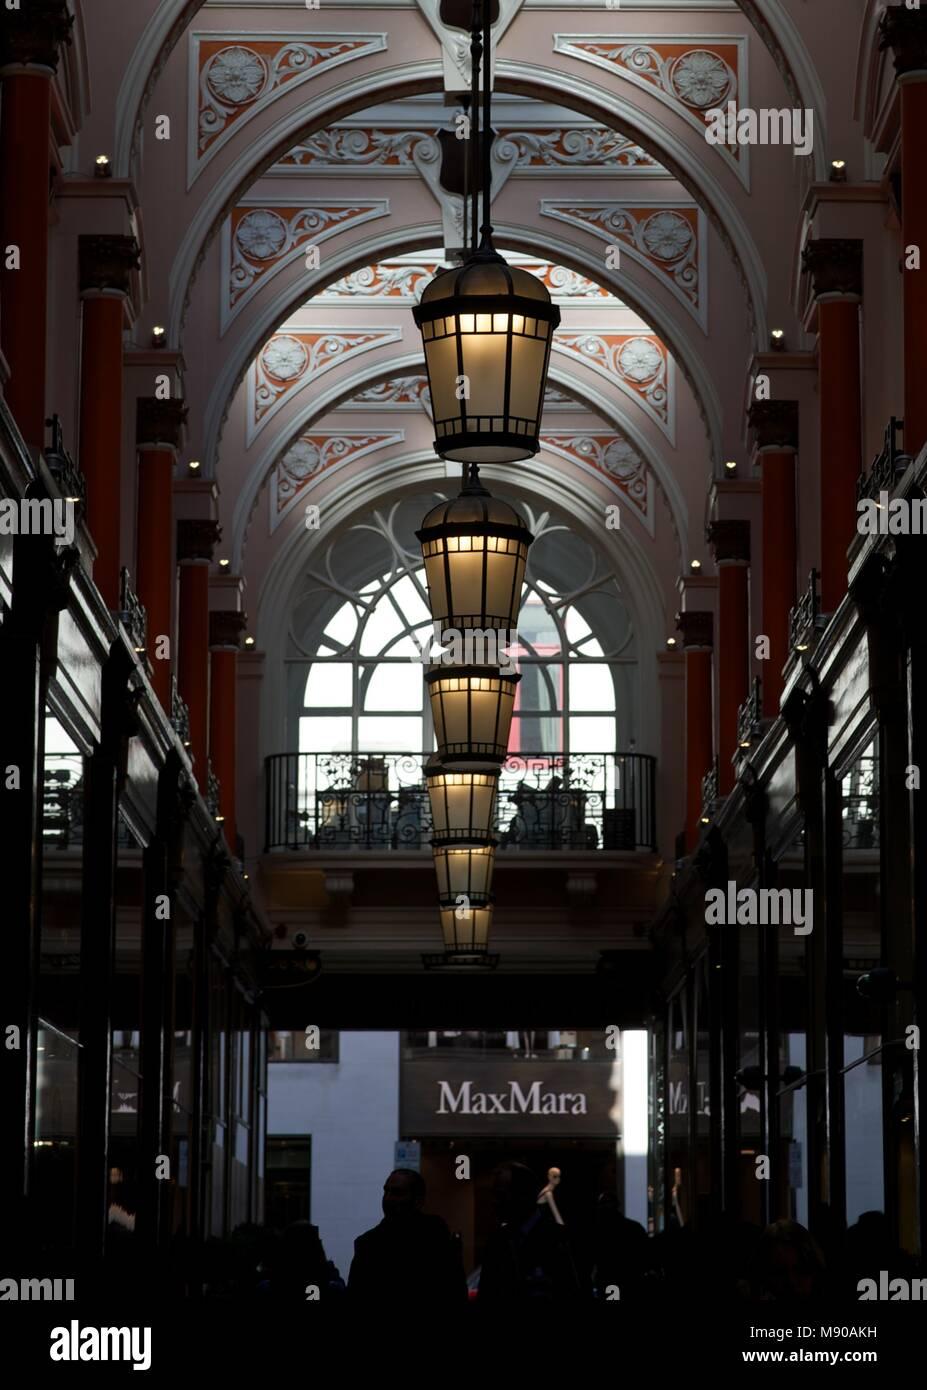 Albermarle arcade, mayfair london - Stock Image